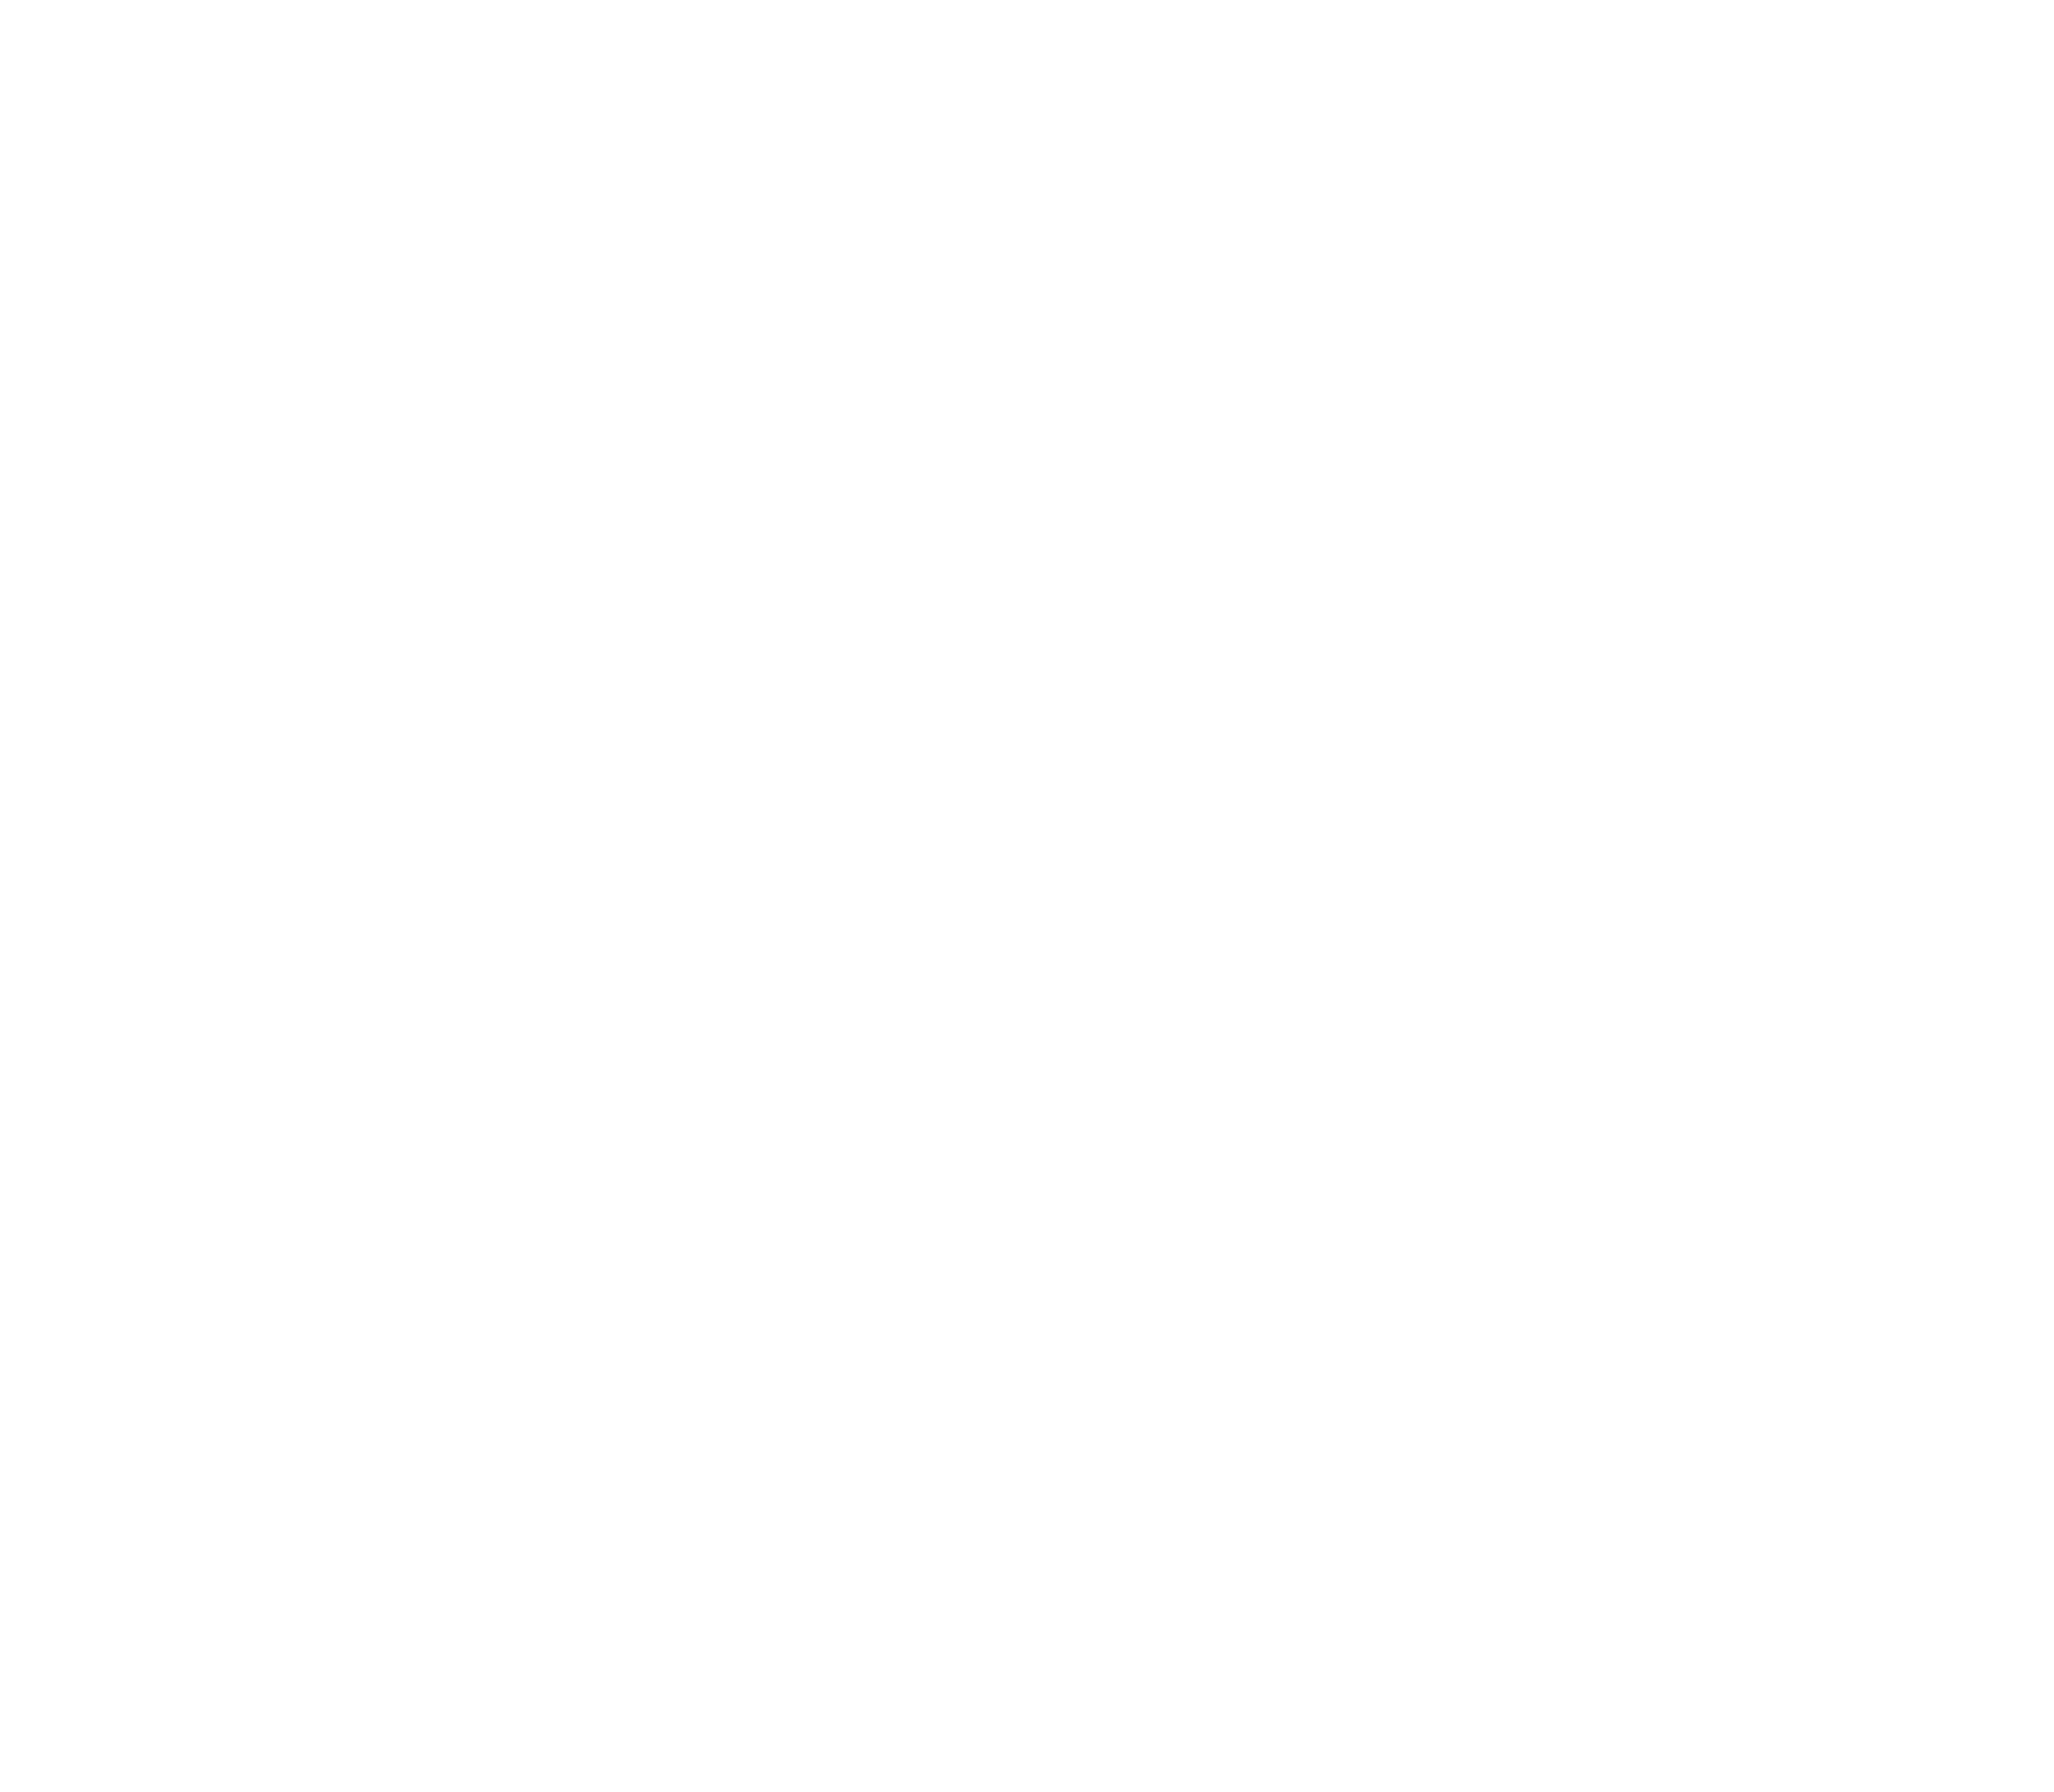 Jonas-final-02